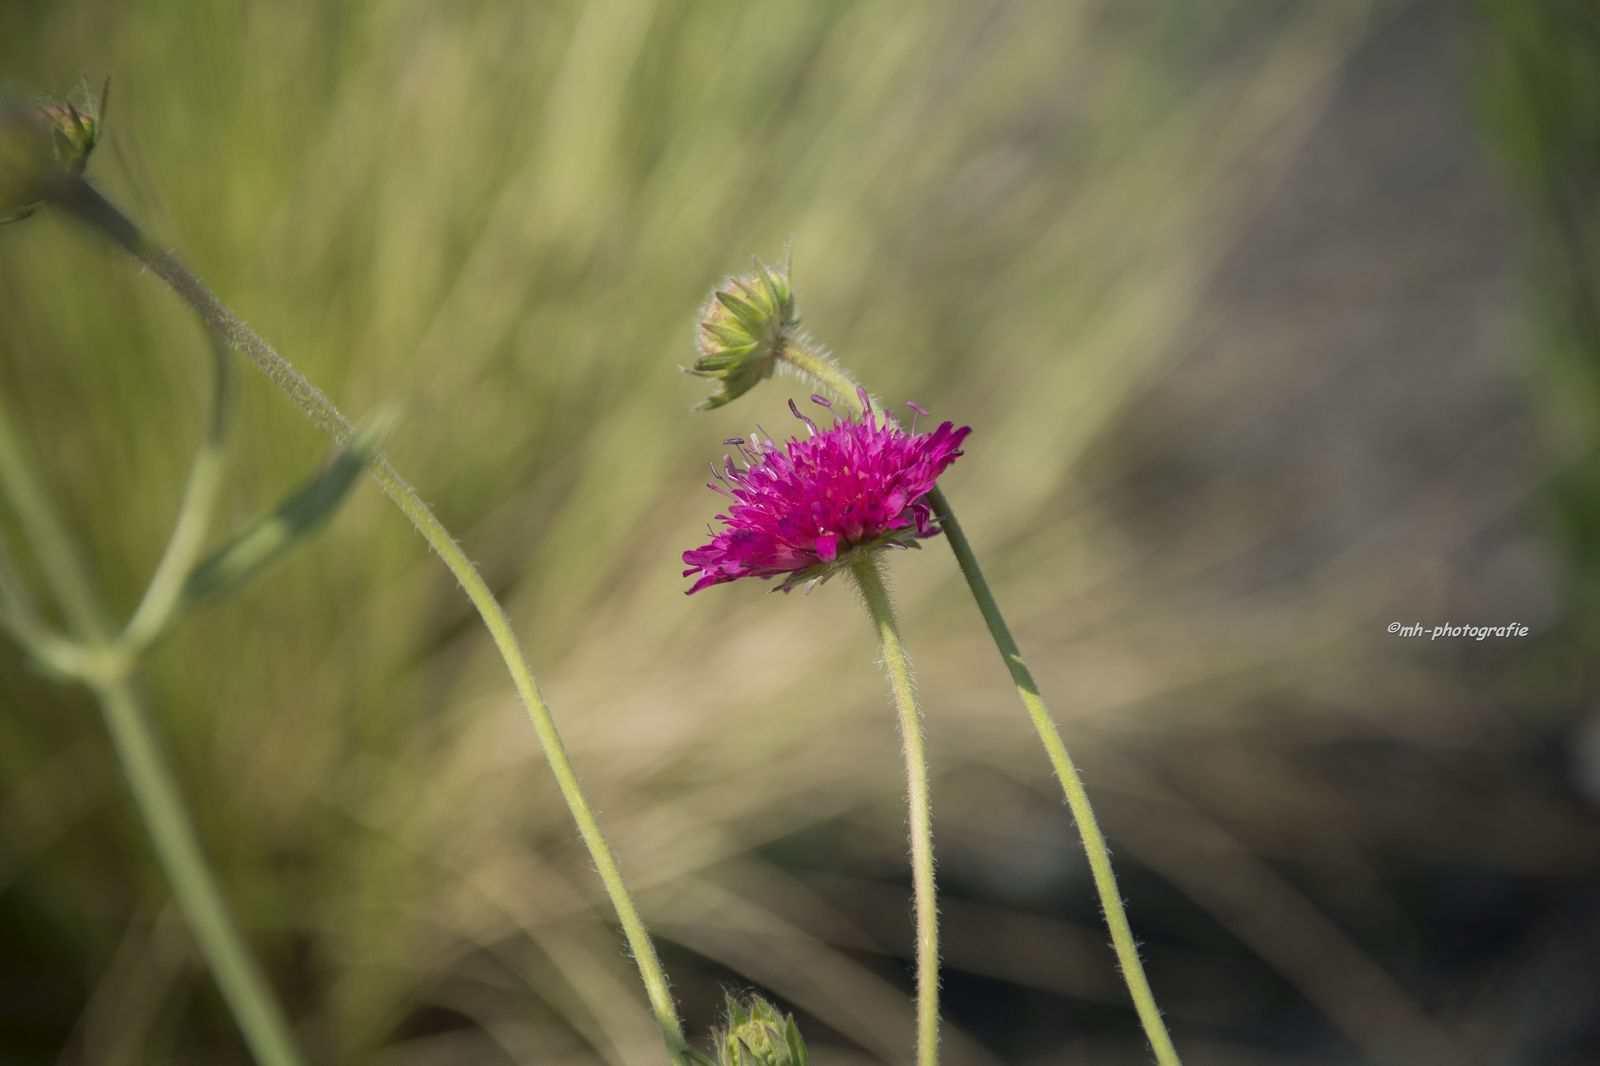 Blumen-DSC_4940-mh-photografie